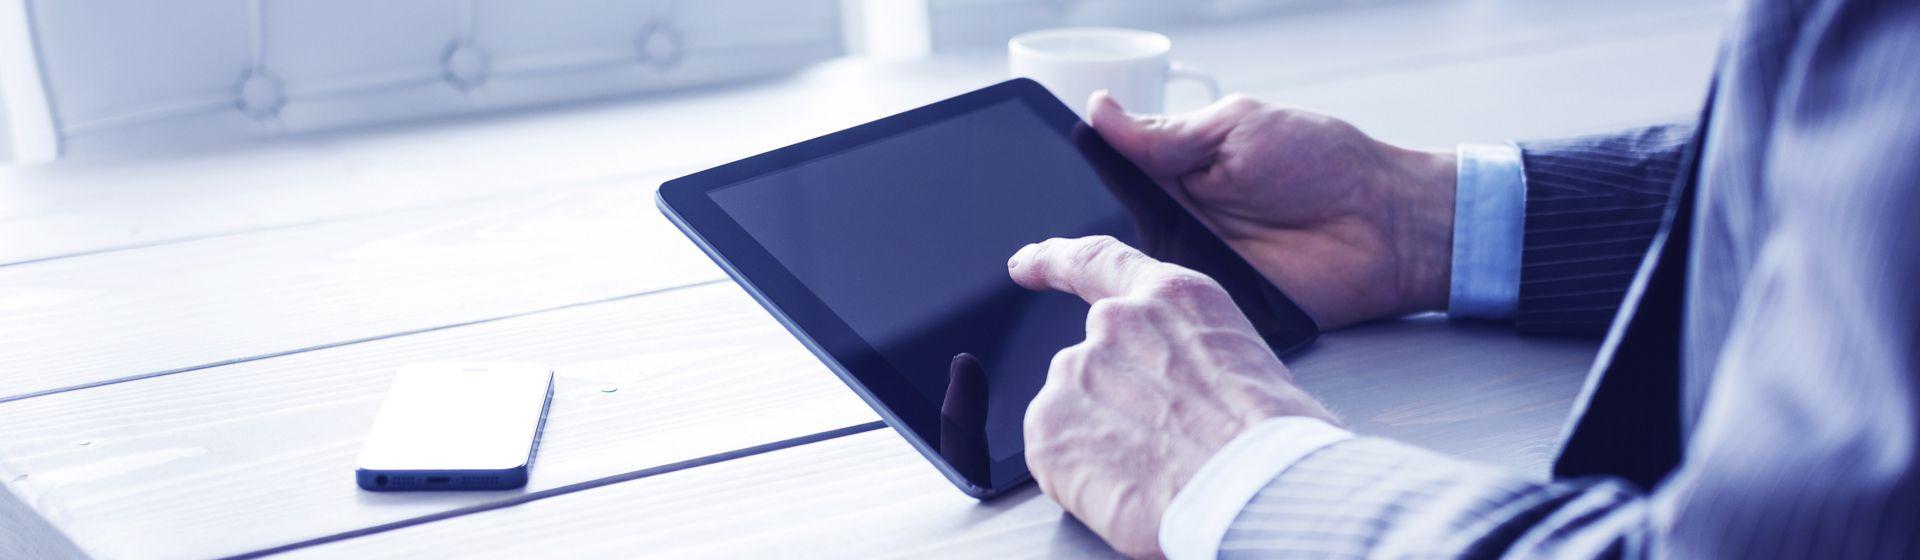 Galaxy Tab s5e: um bom tablet com tela Super AMOLED